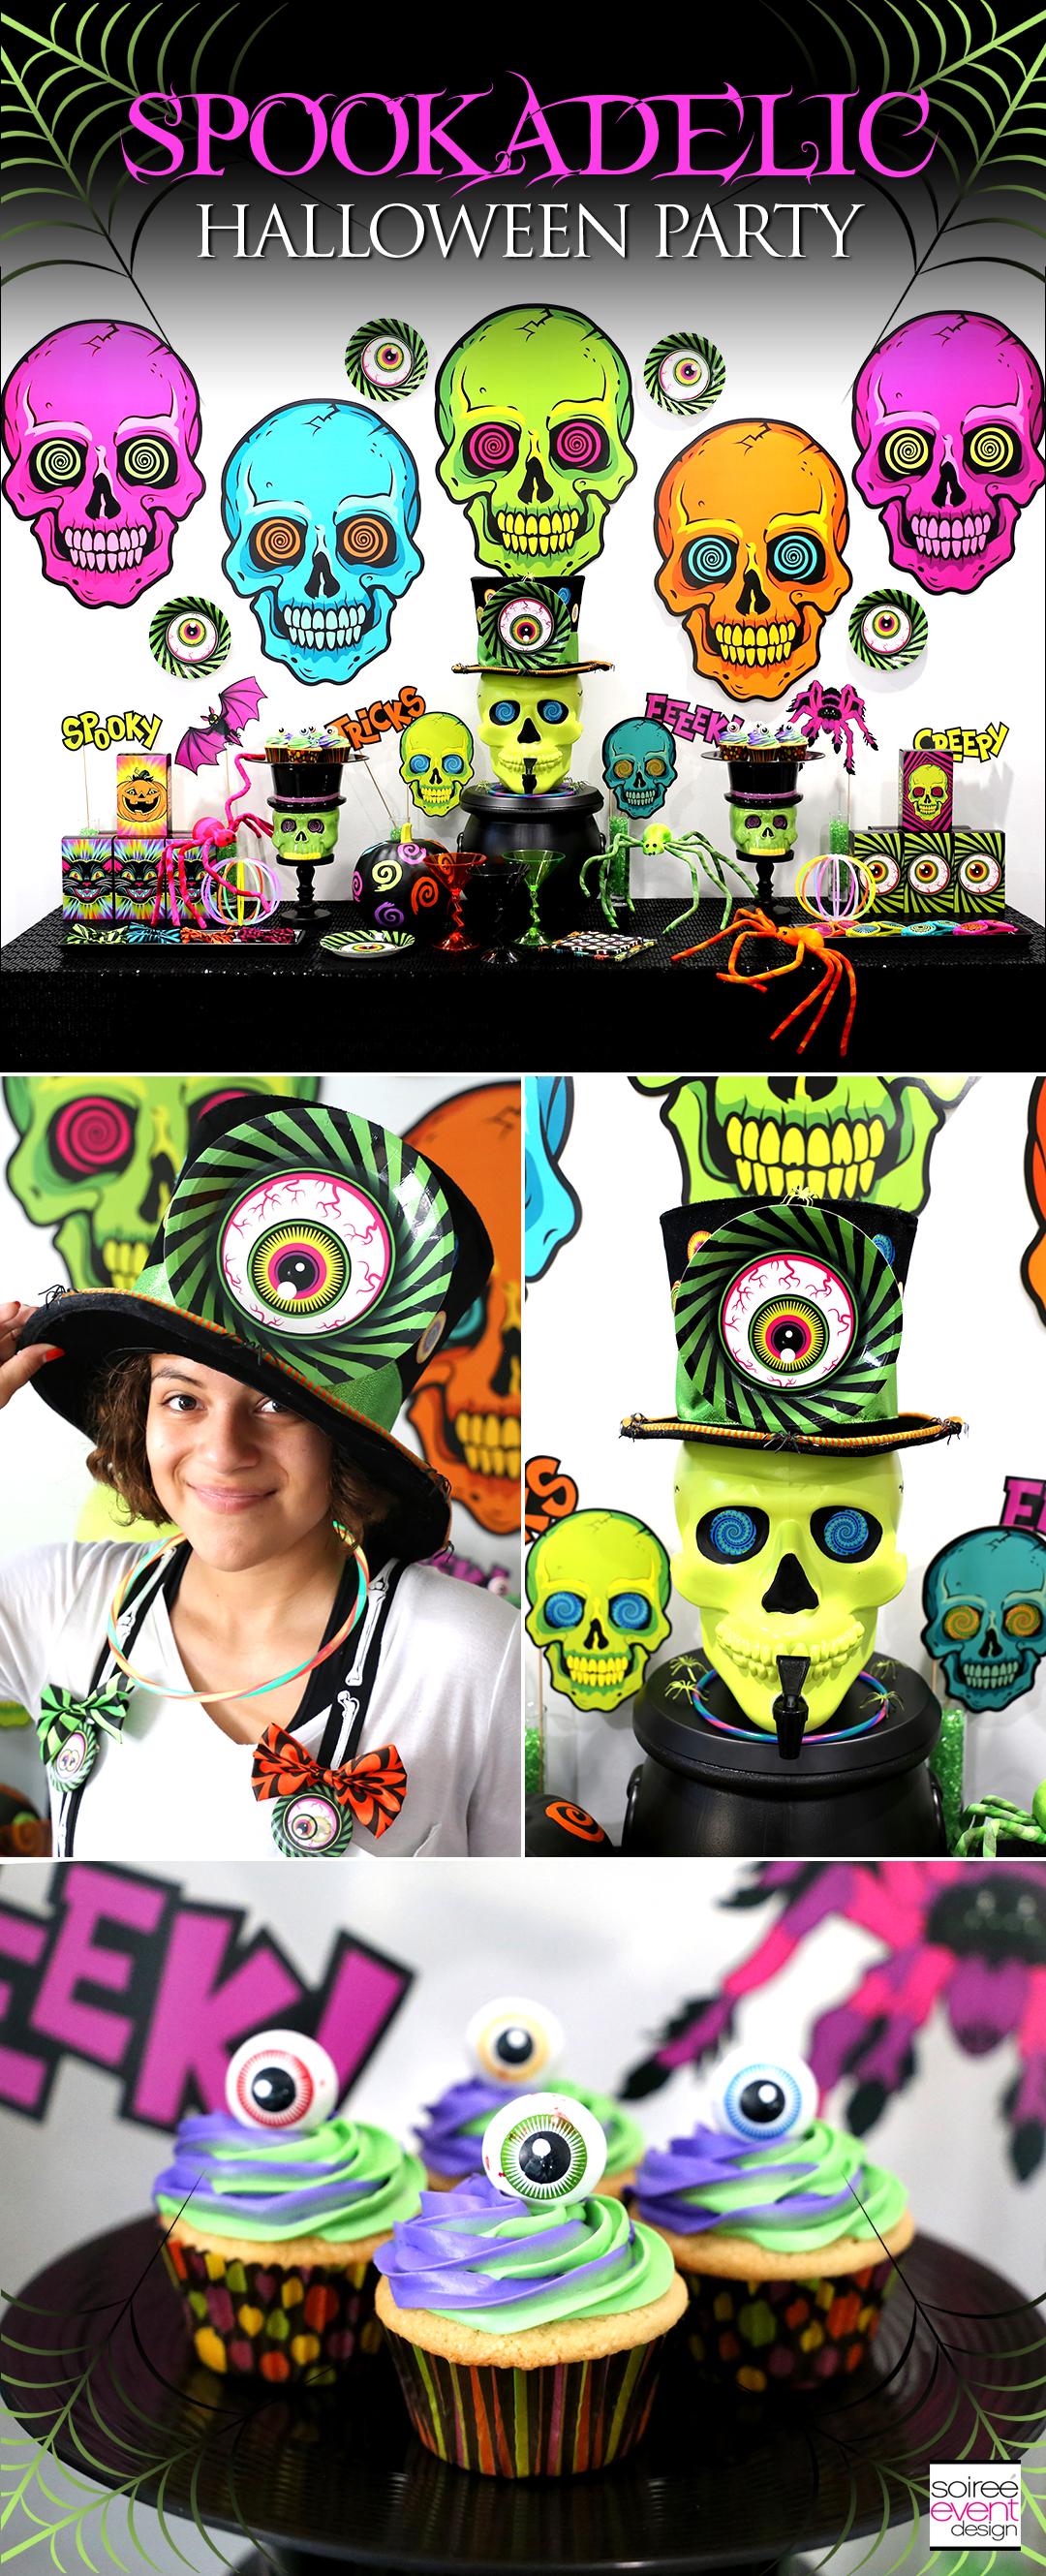 Kid-Friendly Spookadelic Halloween Party Ideas